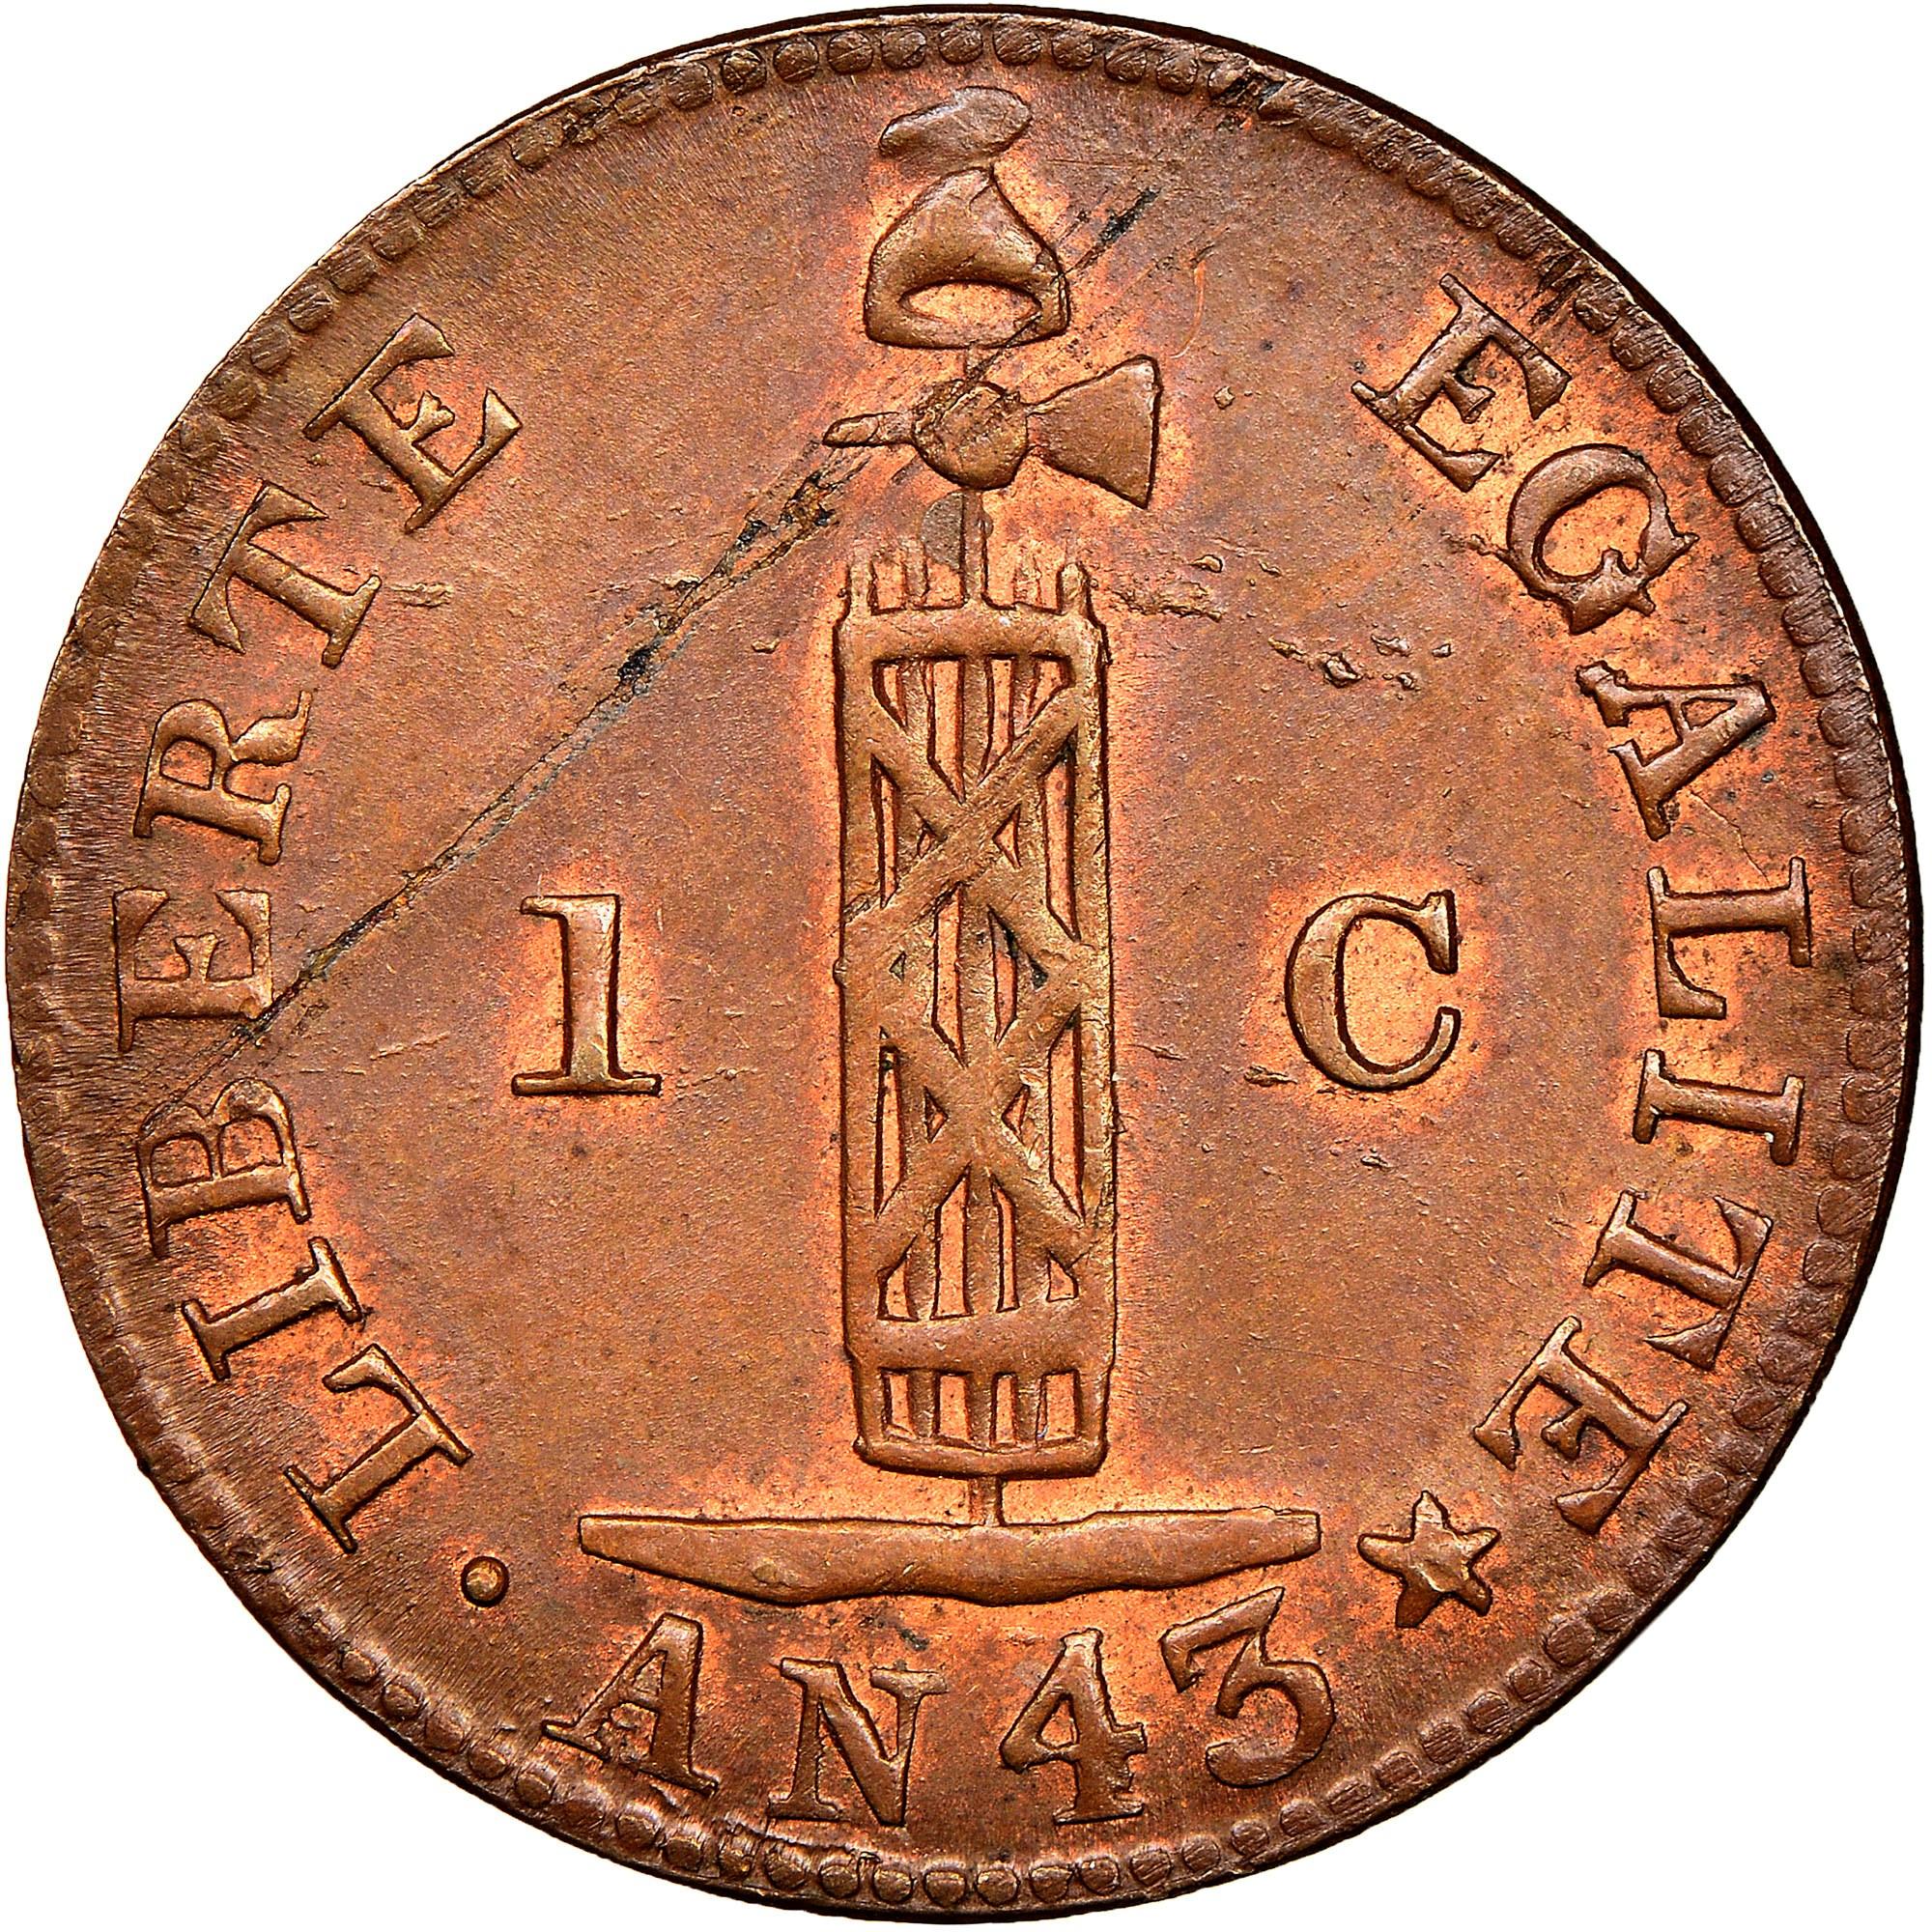 Haiti Centime reverse